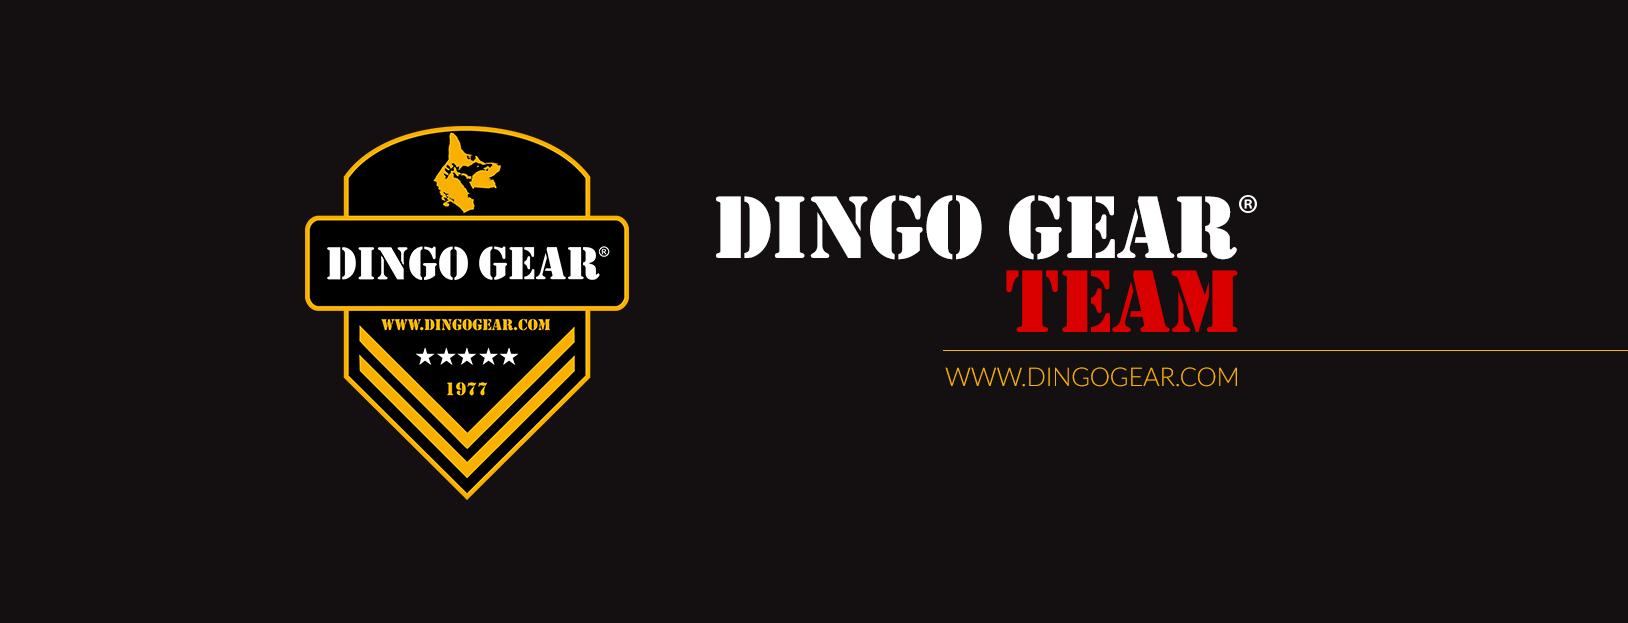 Dingo Gear Team